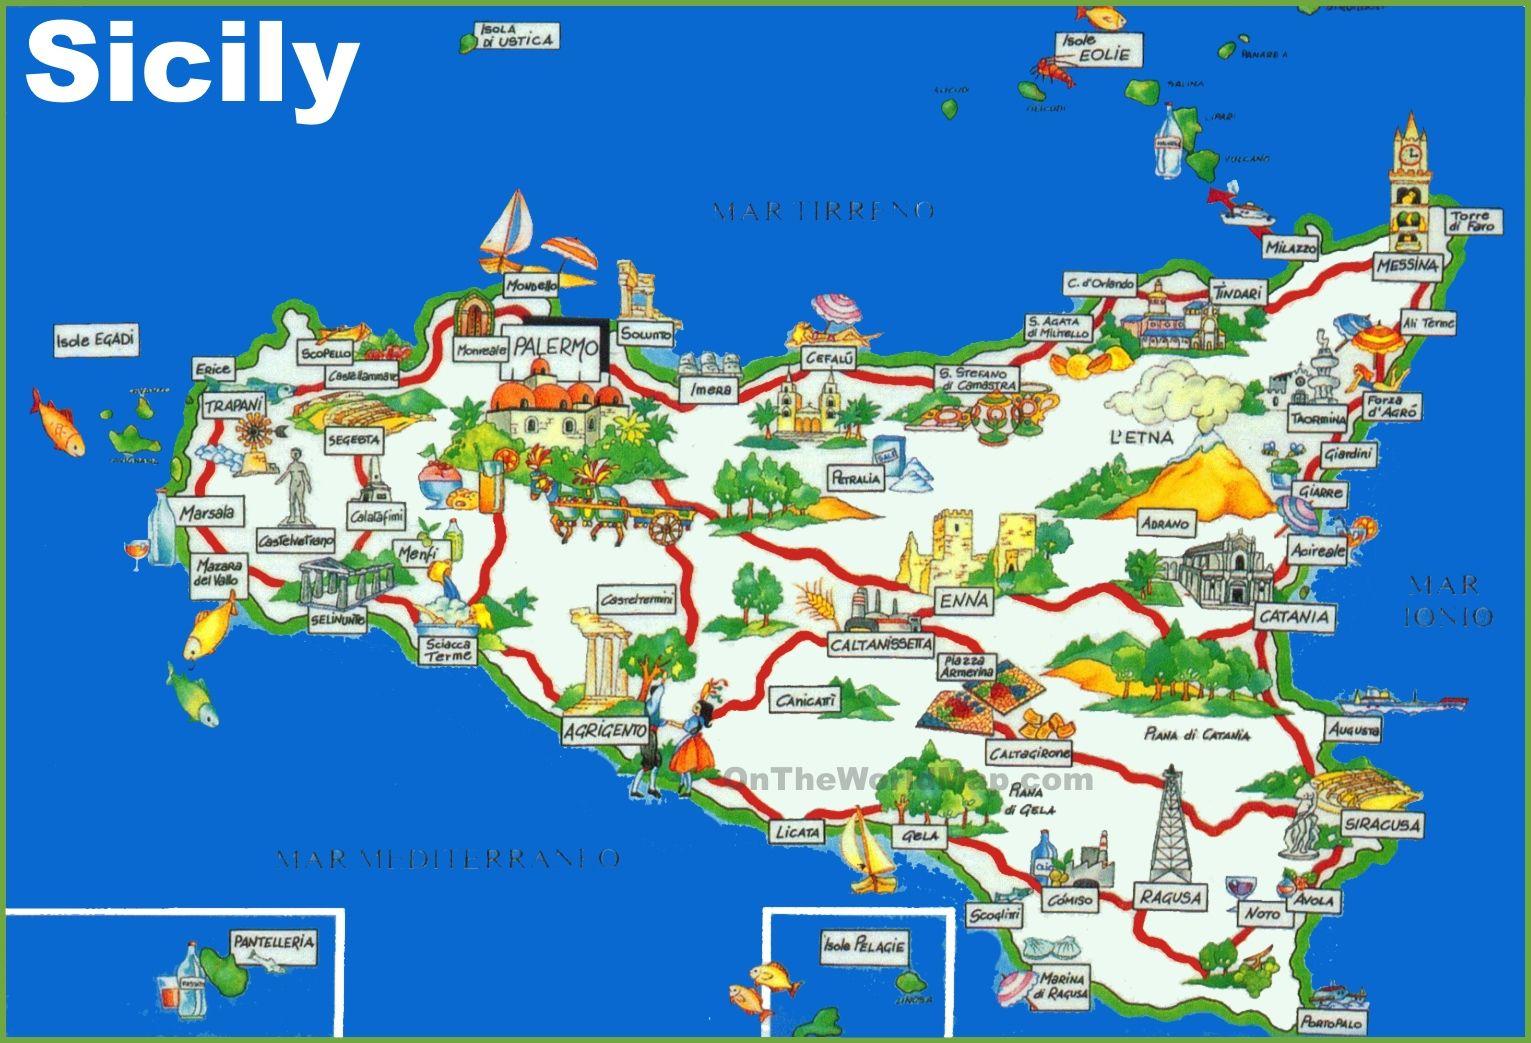 Sicily tourist map | Sicily 2018 | Tourist map, Sicily, Italy